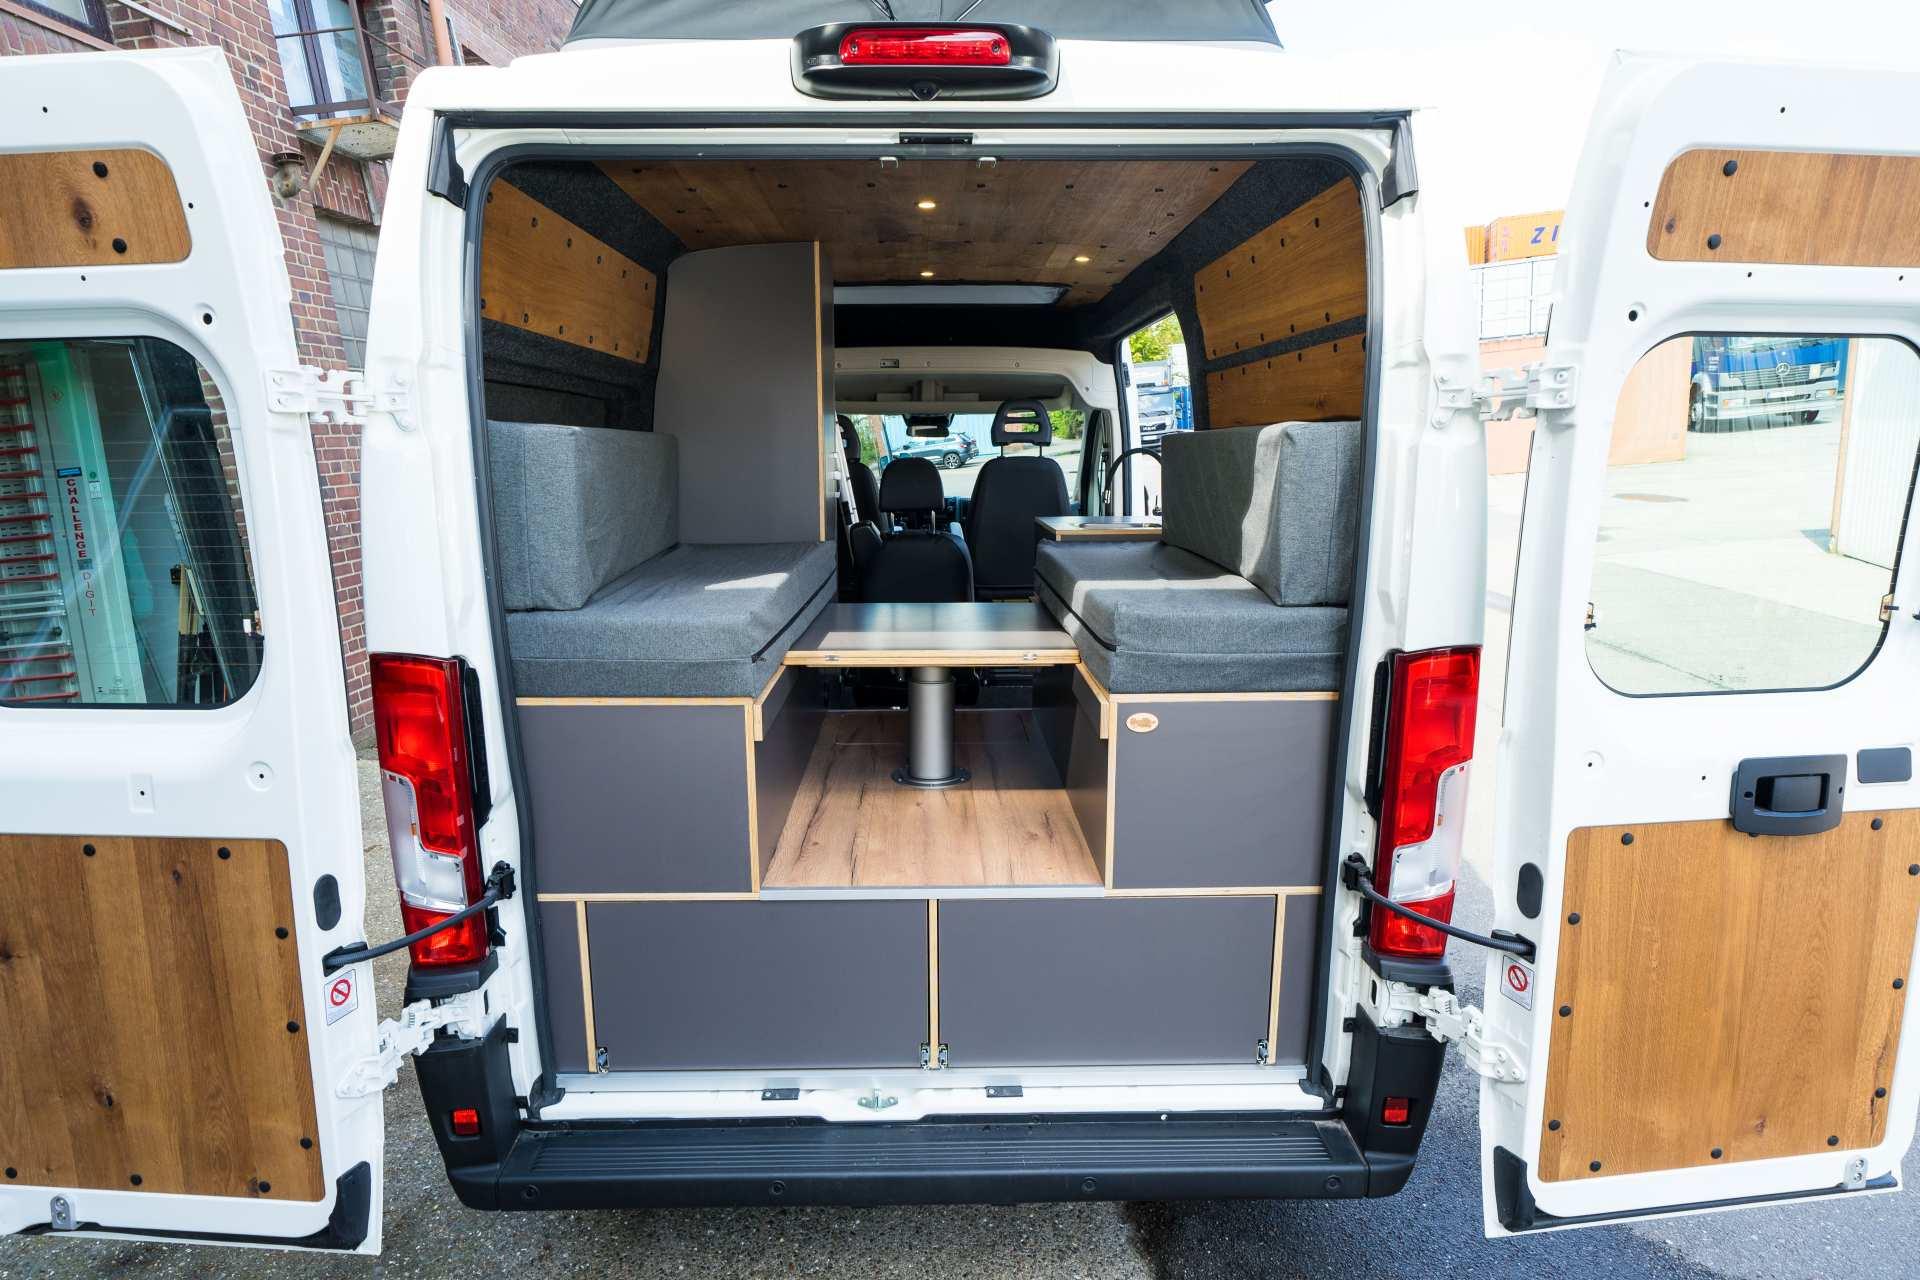 Individualausbau: Zwei-Raumwohnung Peugeot Boxer L2 H2 - 8